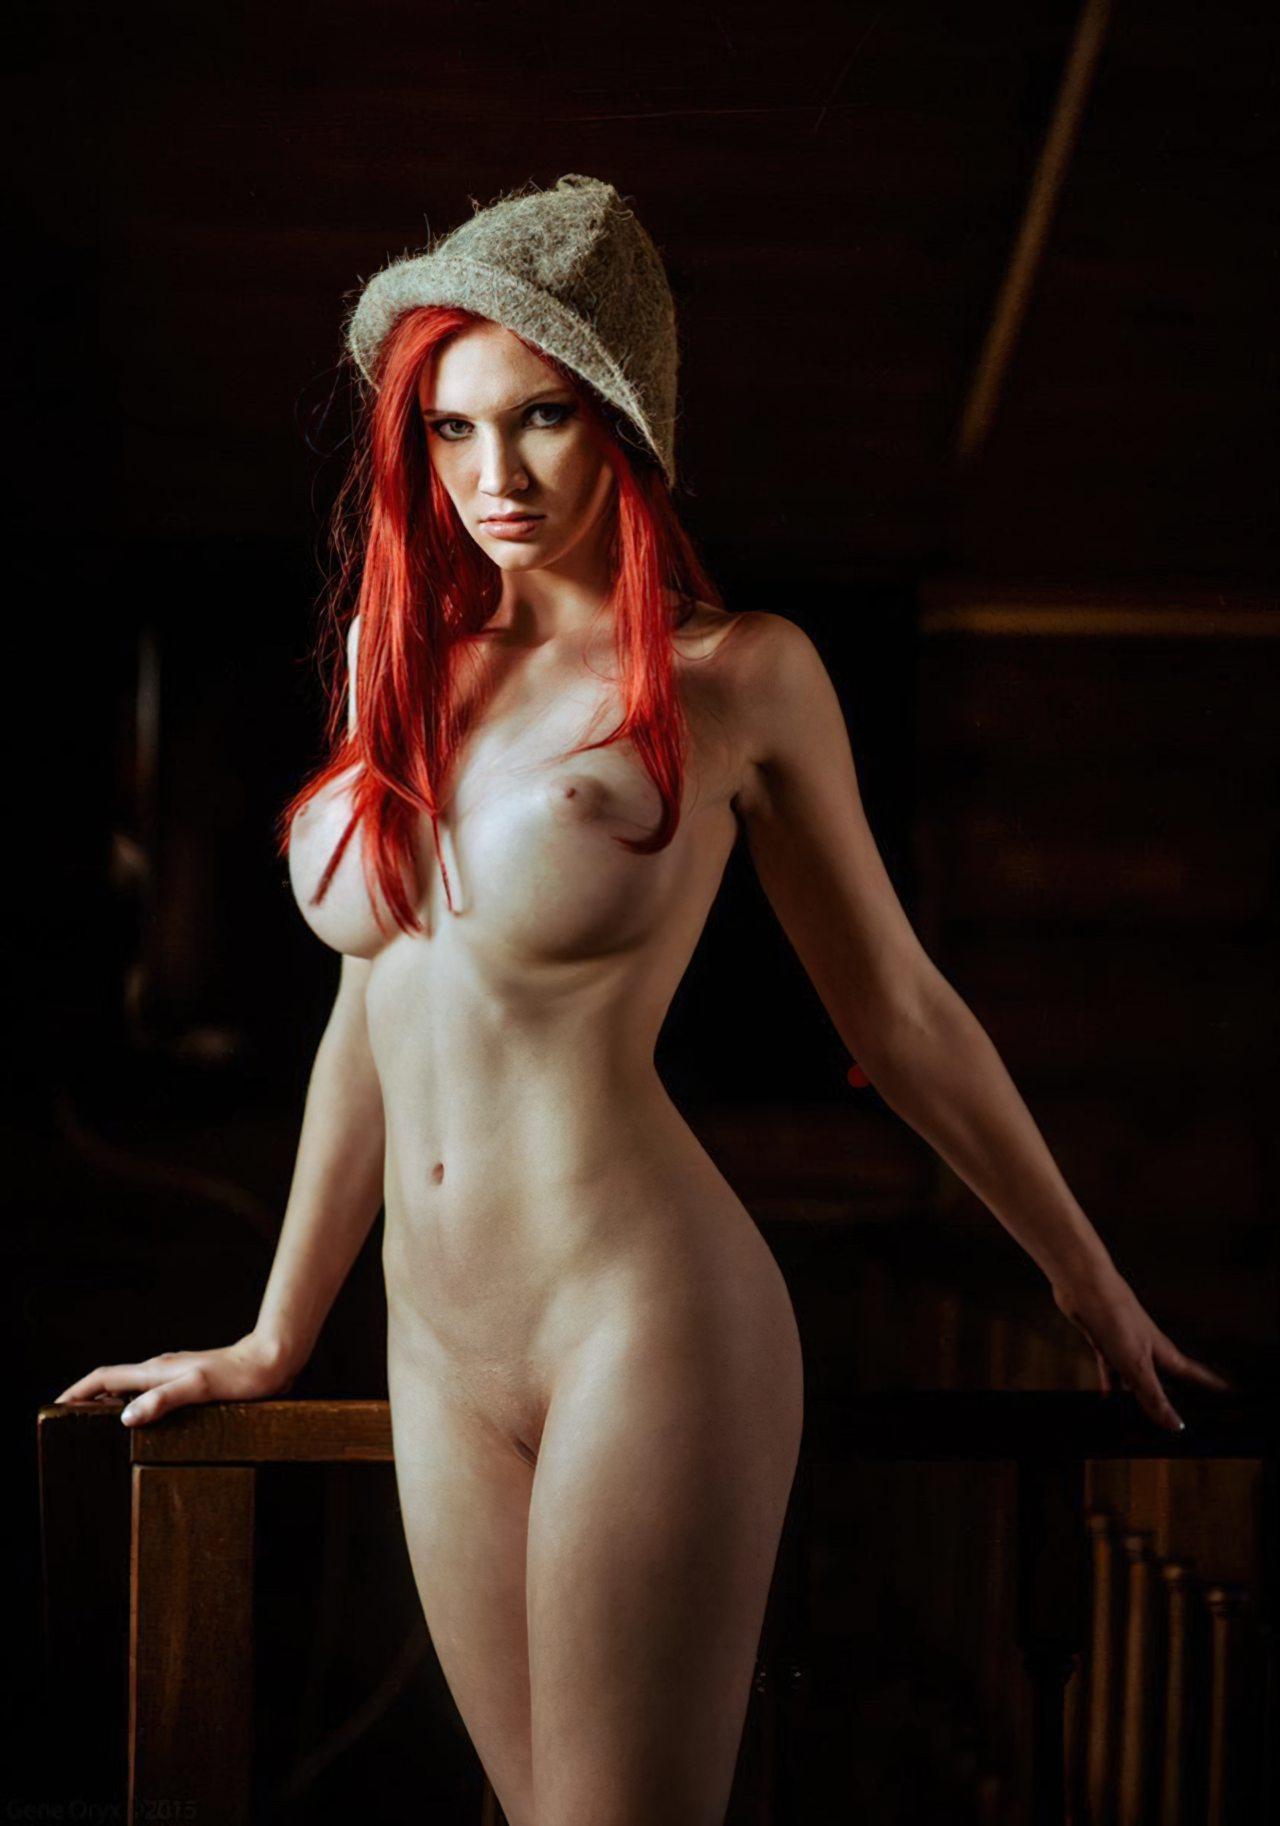 Mulheres Despidas (32)